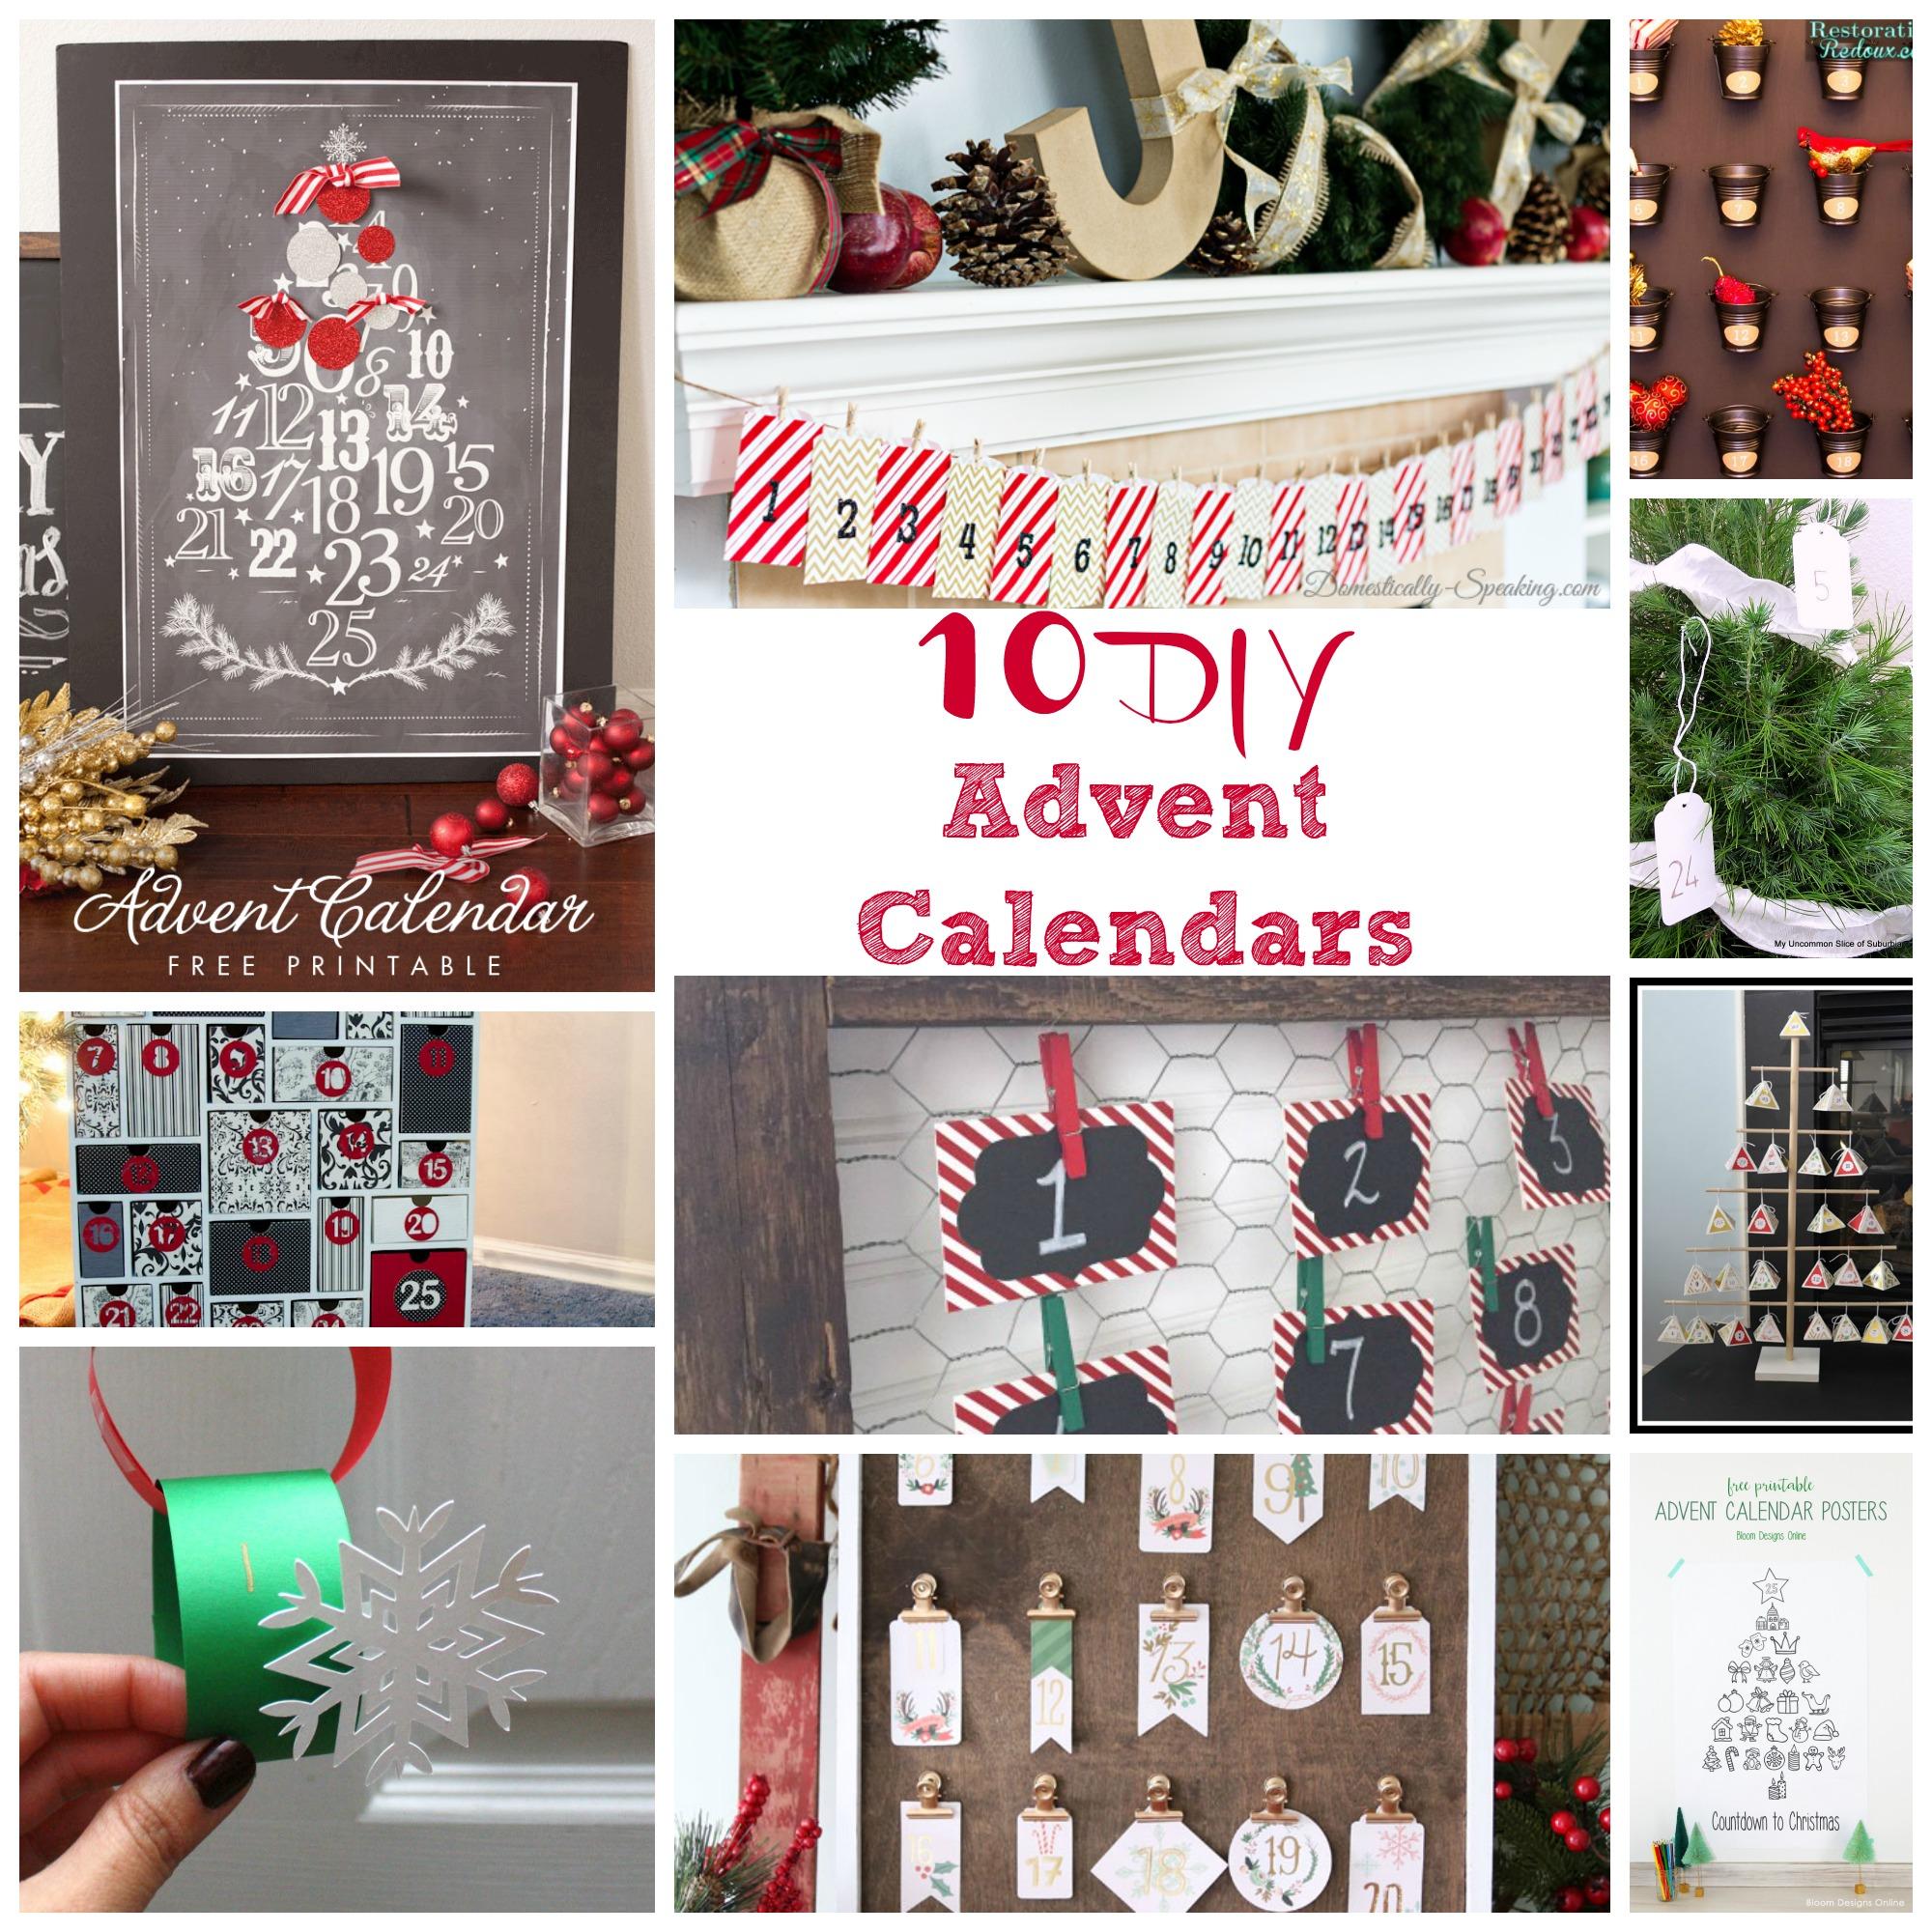 10 DIY advent Calendars